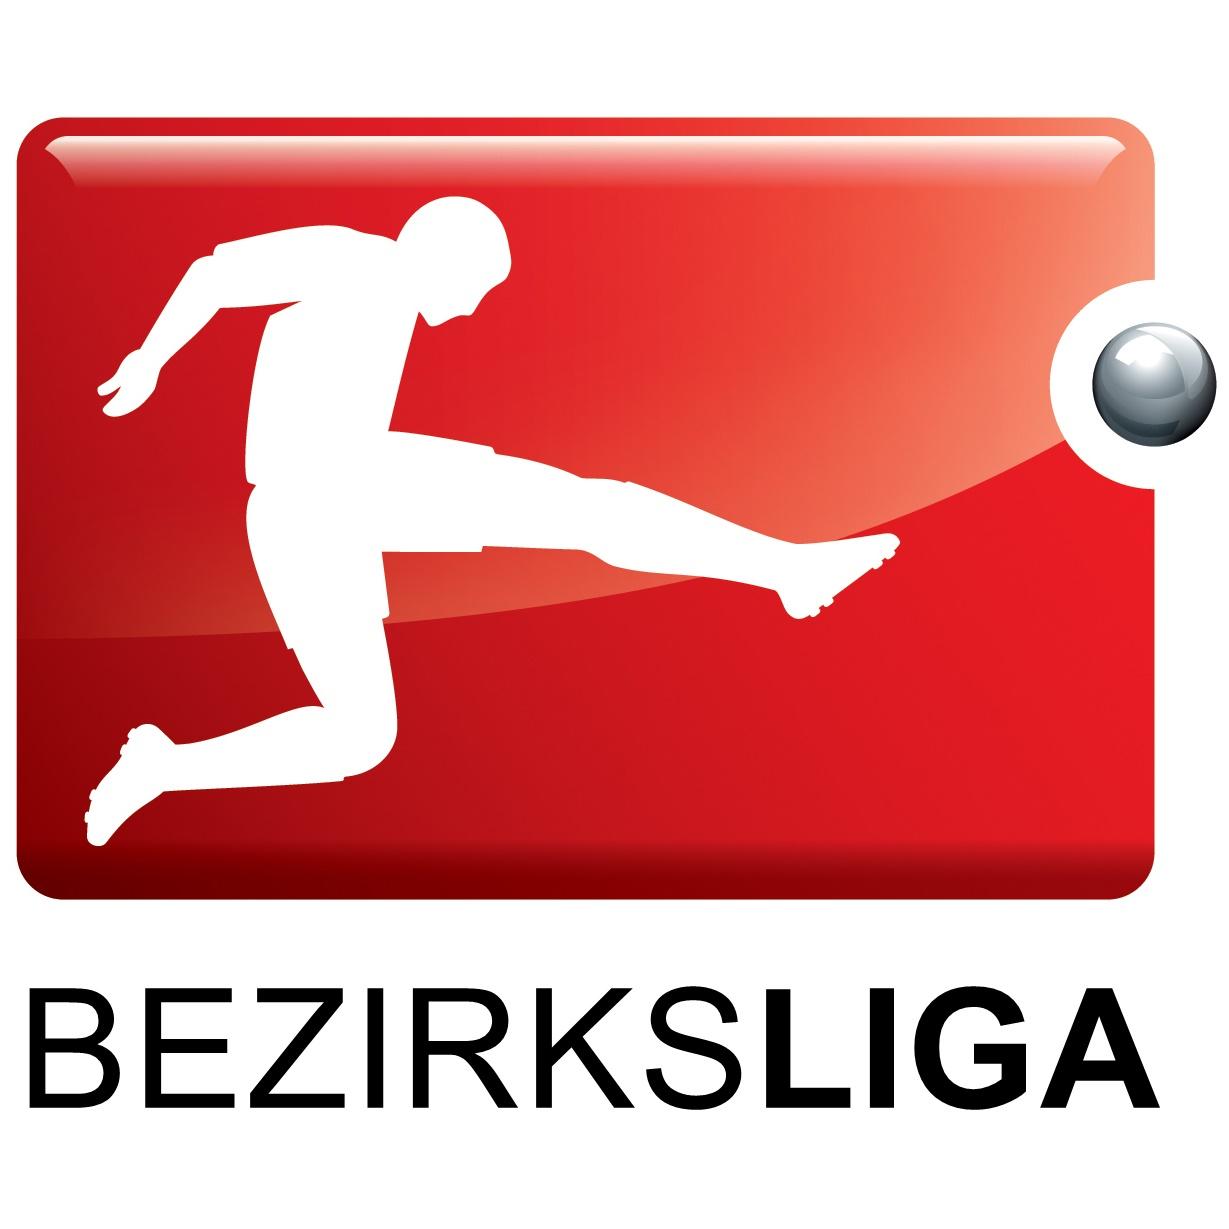 bezirksliga-logo - VfL Benrath 06 e.V.